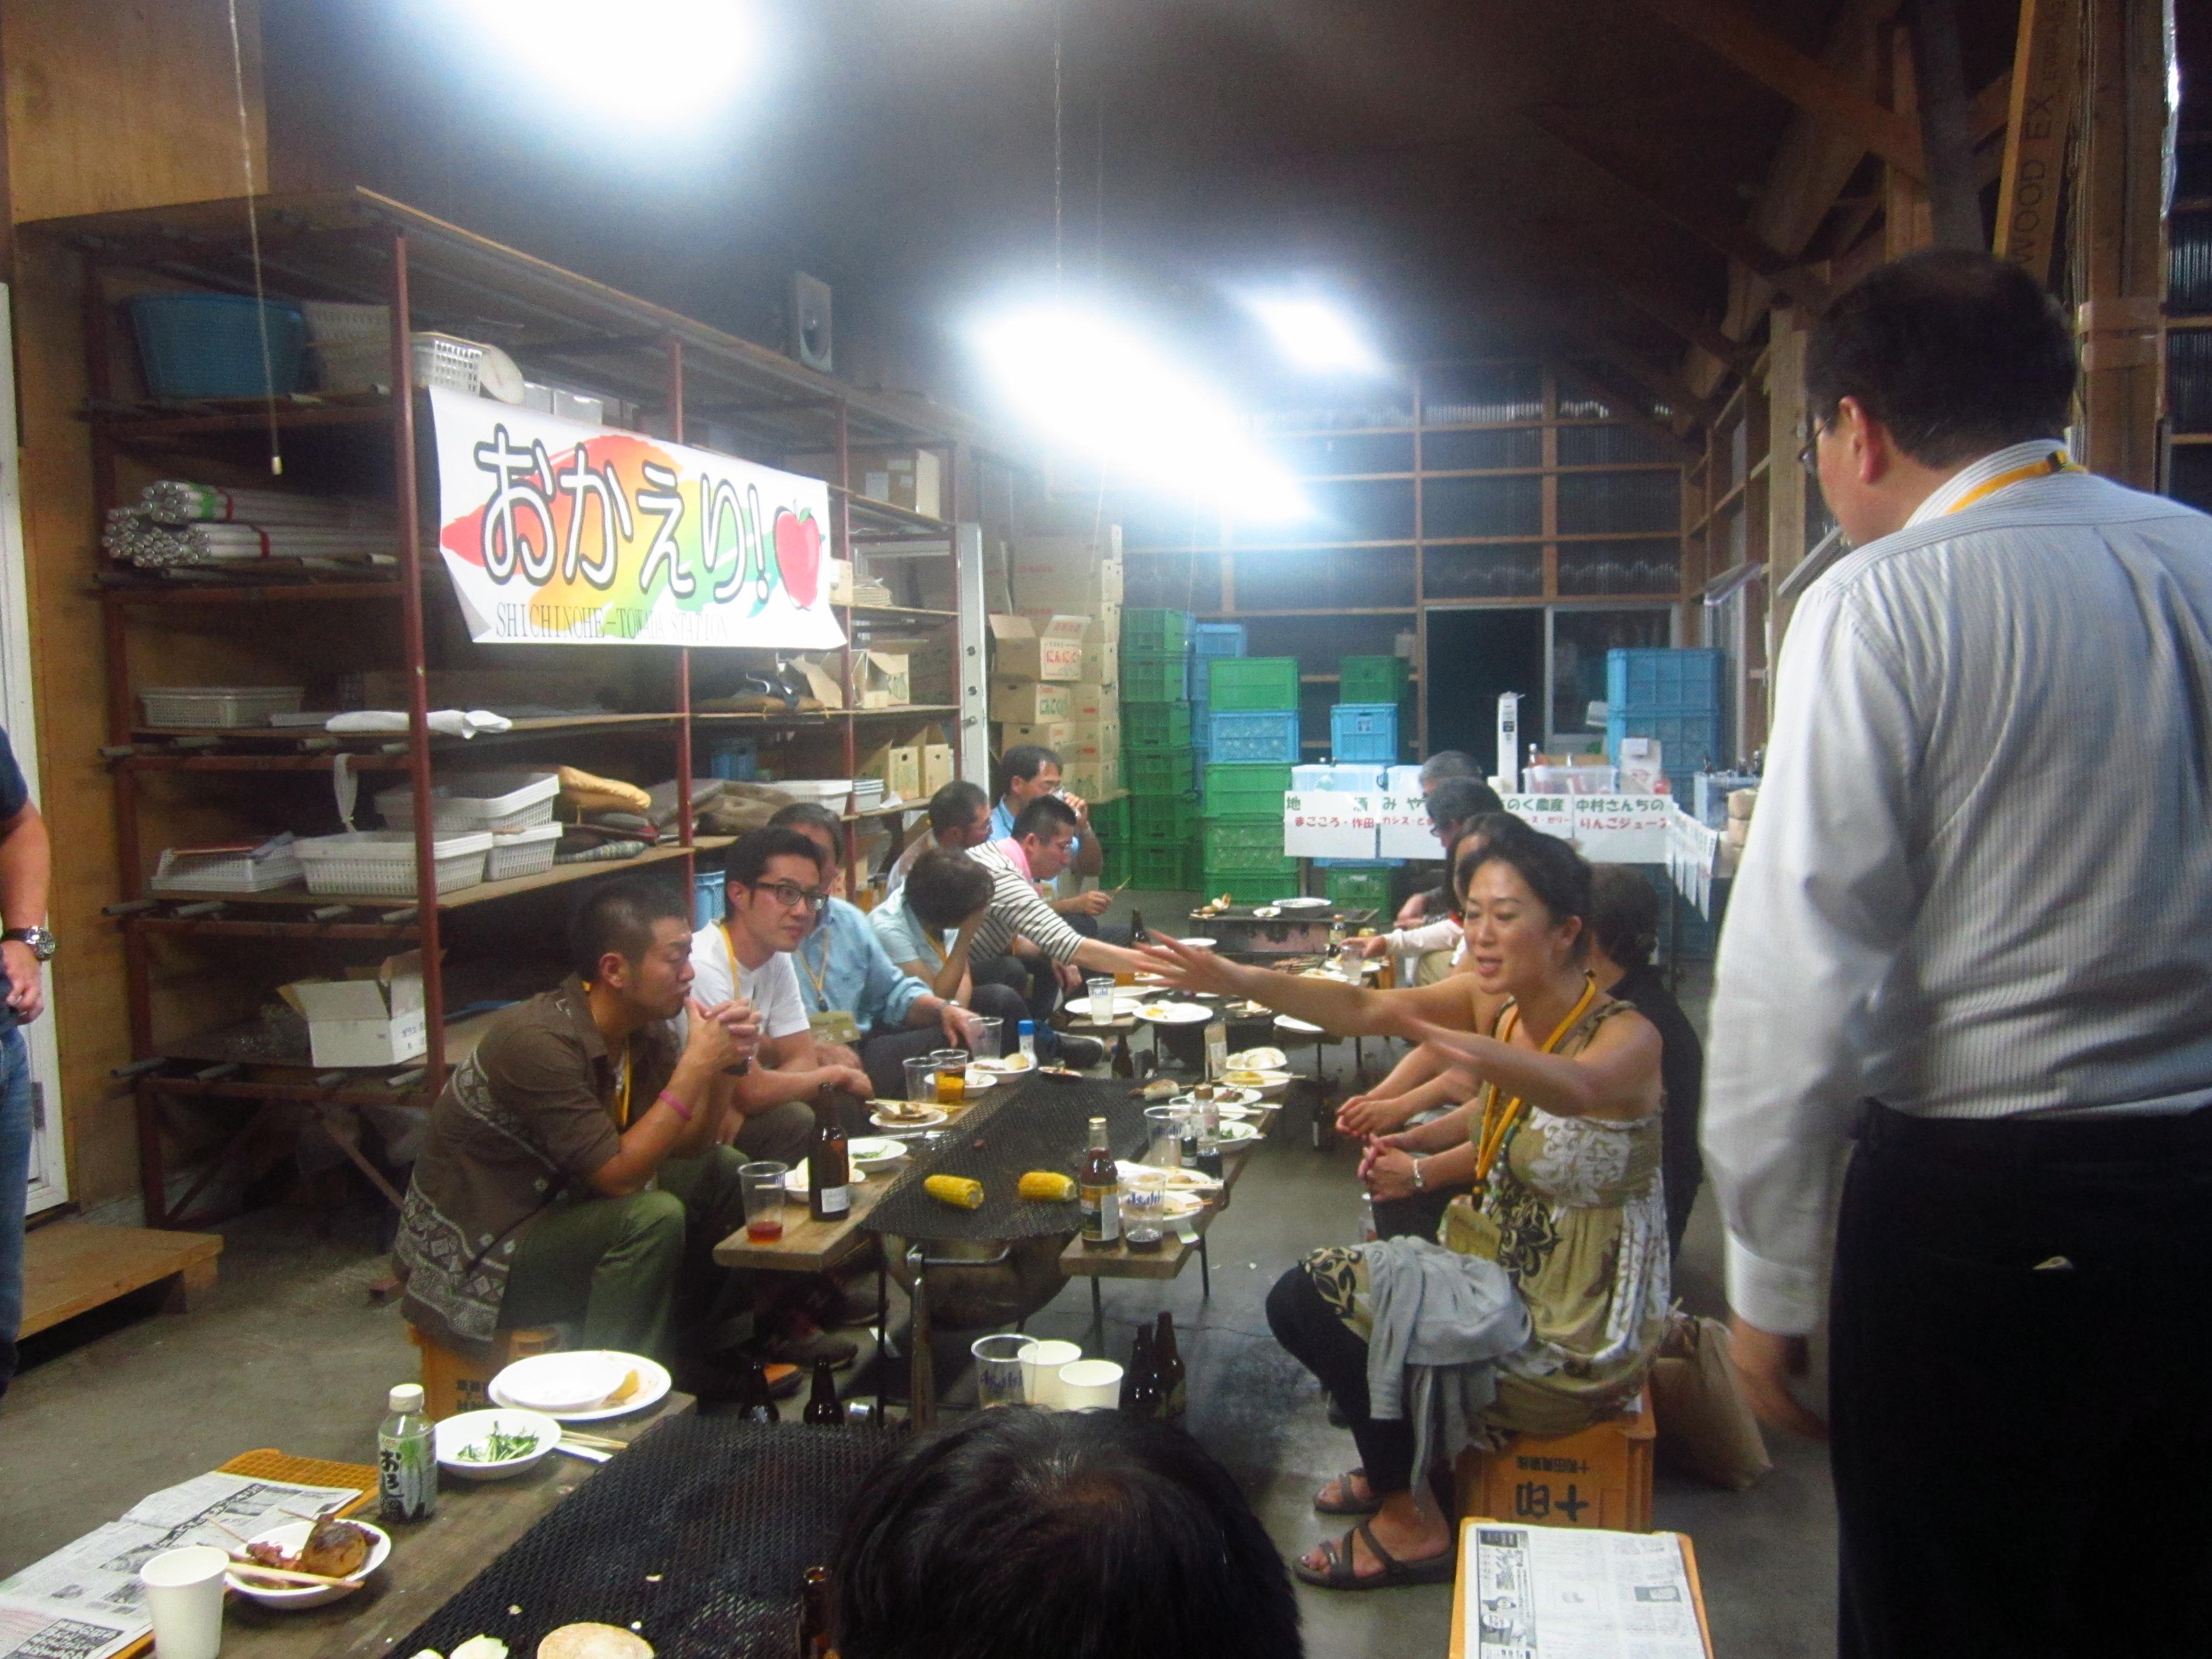 IMG 4353 - 麻布十番納涼祭り25,26日(七戸町出店)